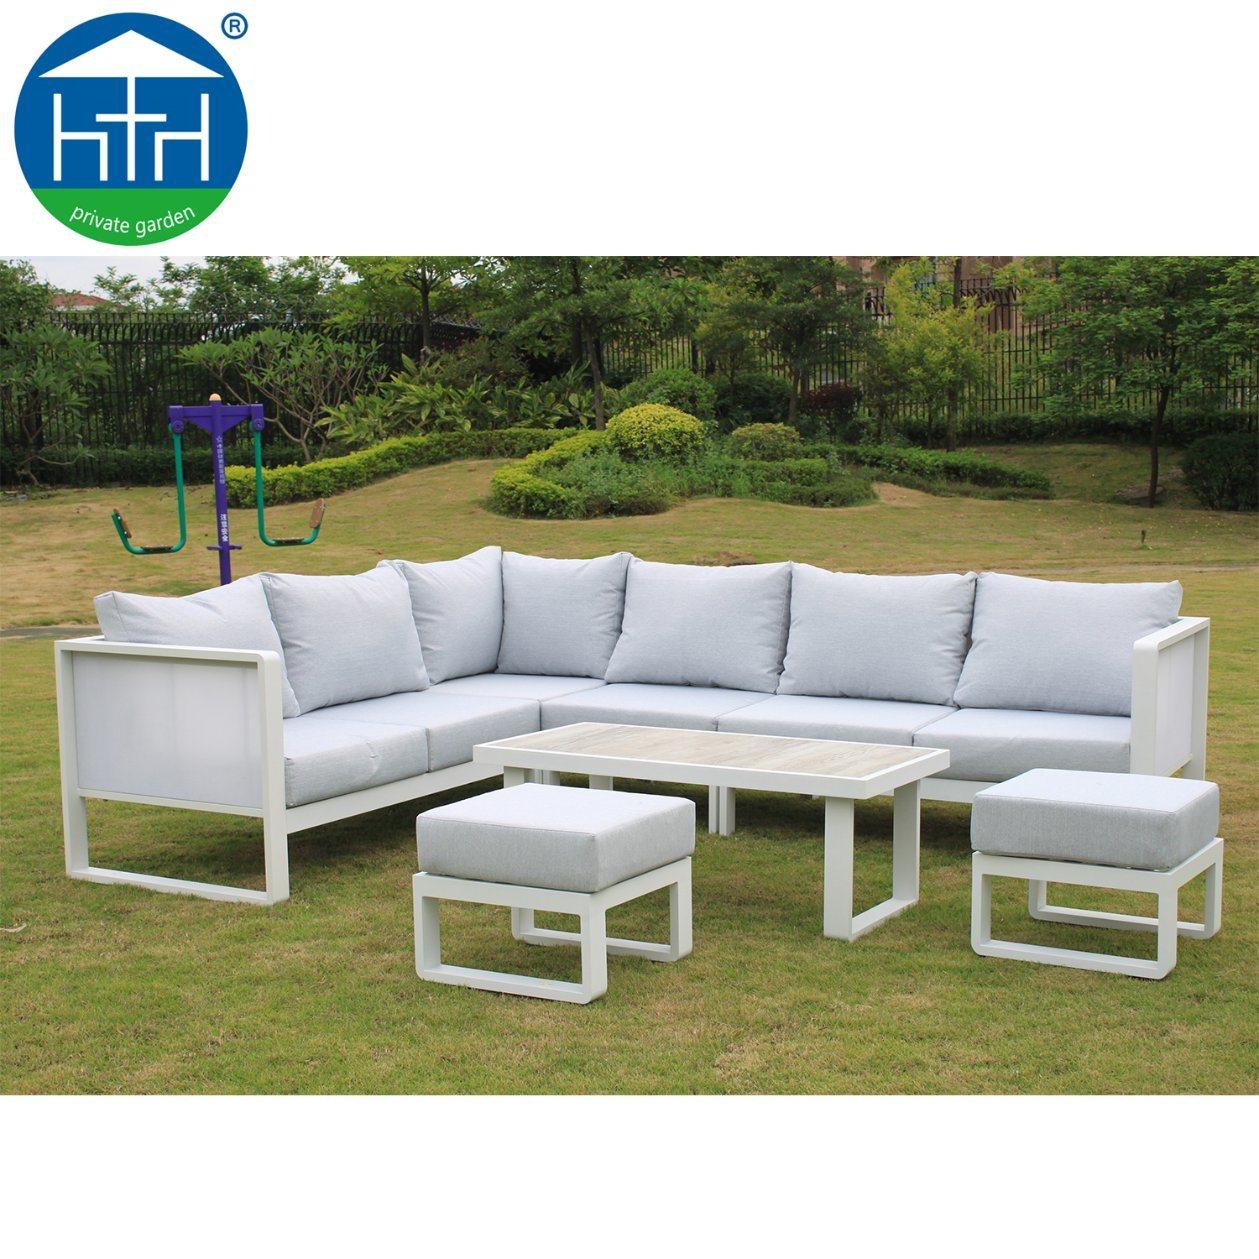 China Luxury Garden Furniture Aluminum